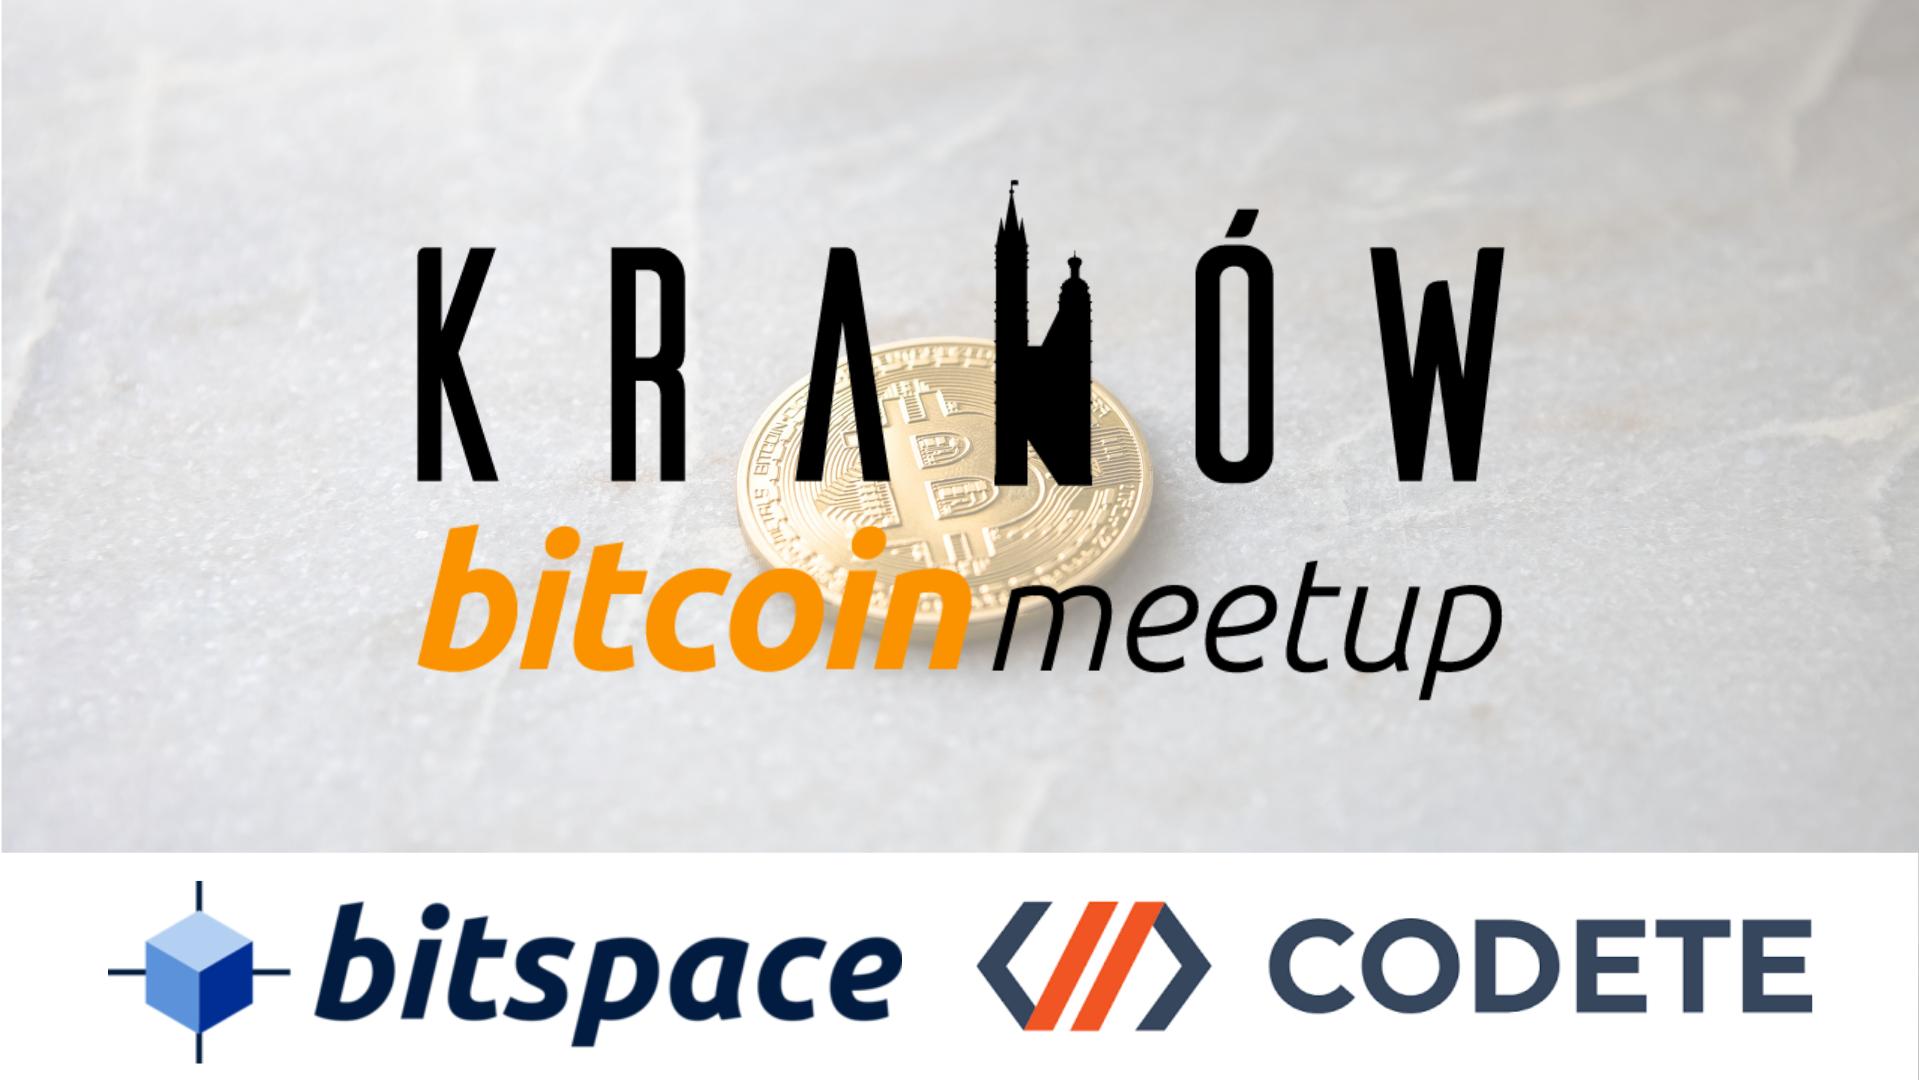 Kraków Bitcoin Meetup